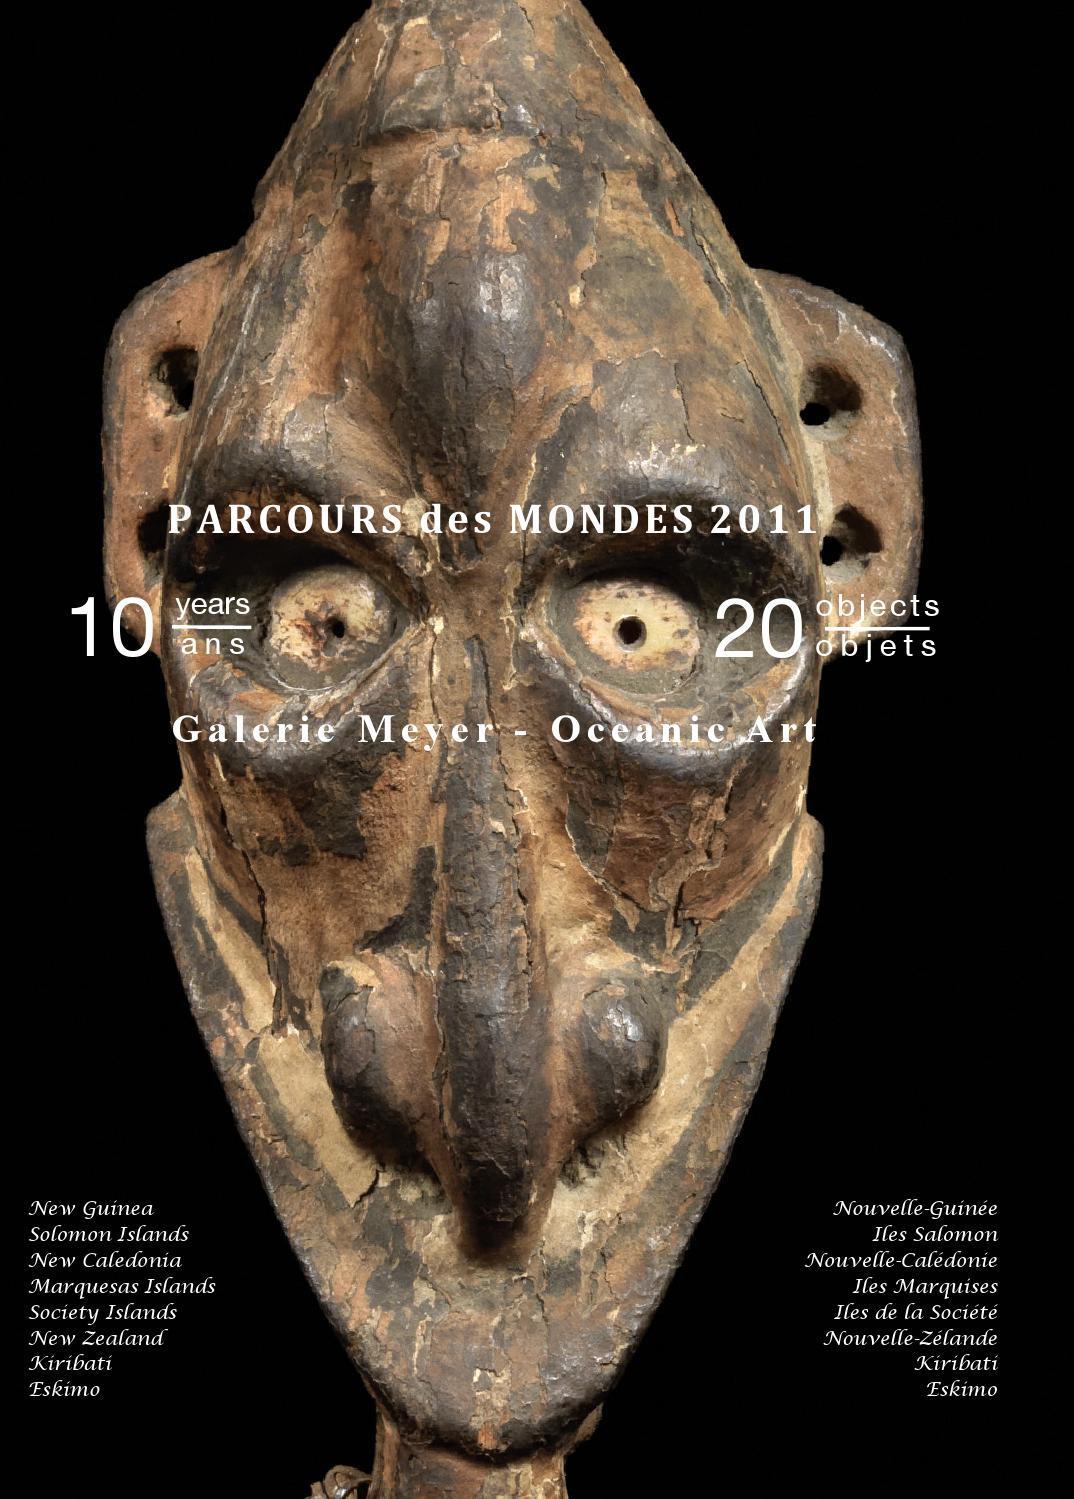 galerie meyer oceanic eskimo art catalogue for parcours des mondes 2011 by galerie meyer. Black Bedroom Furniture Sets. Home Design Ideas